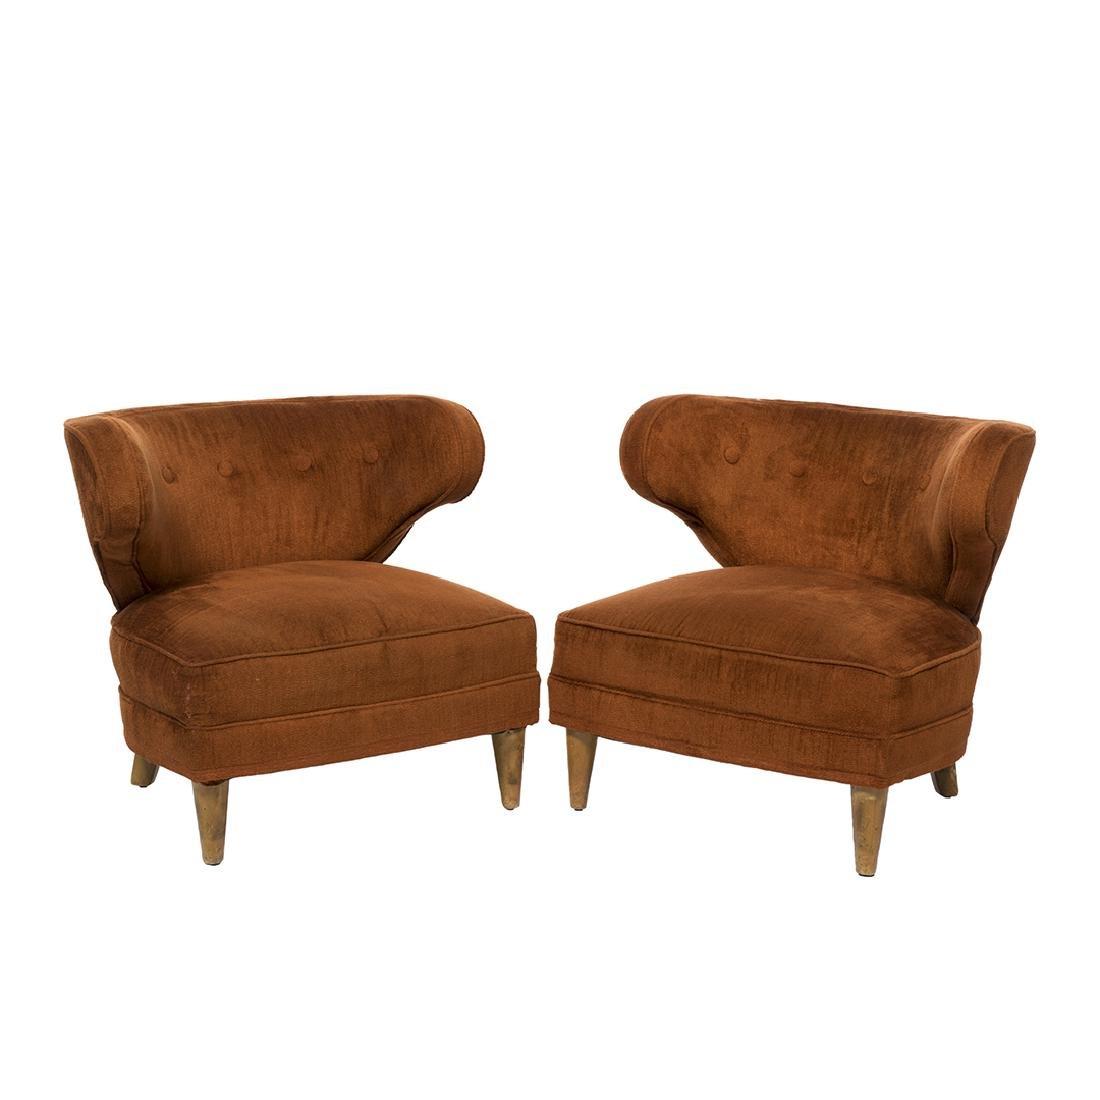 Paul Laszlo Lounge Chairs (2)